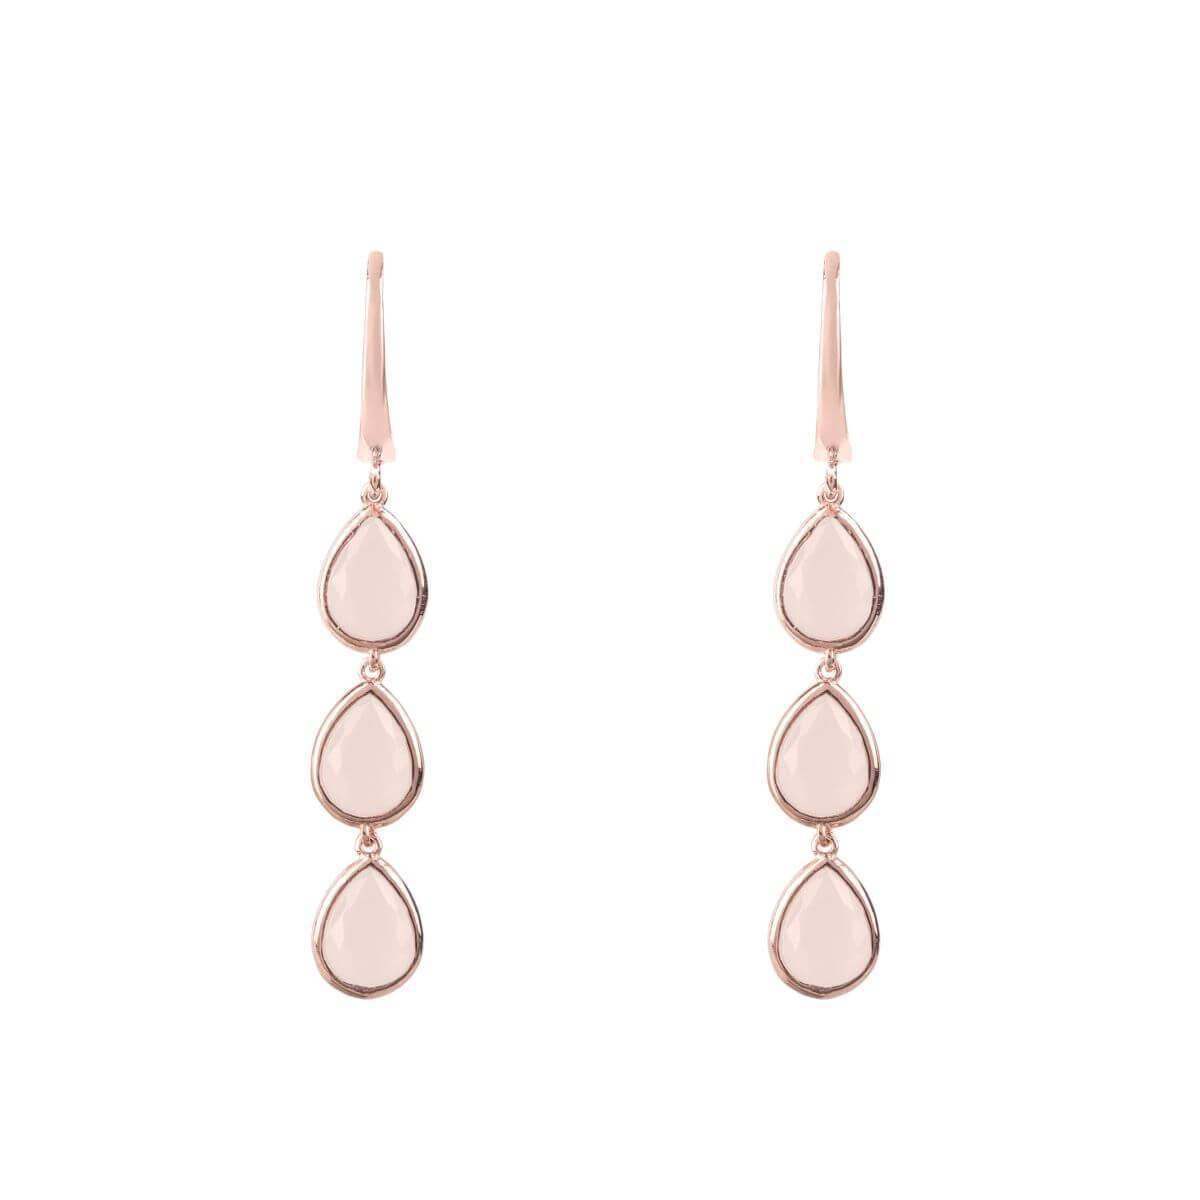 Latelita London Sorrento Triple Drop Earrings Gold Rose Quartz 3HEotJfejK